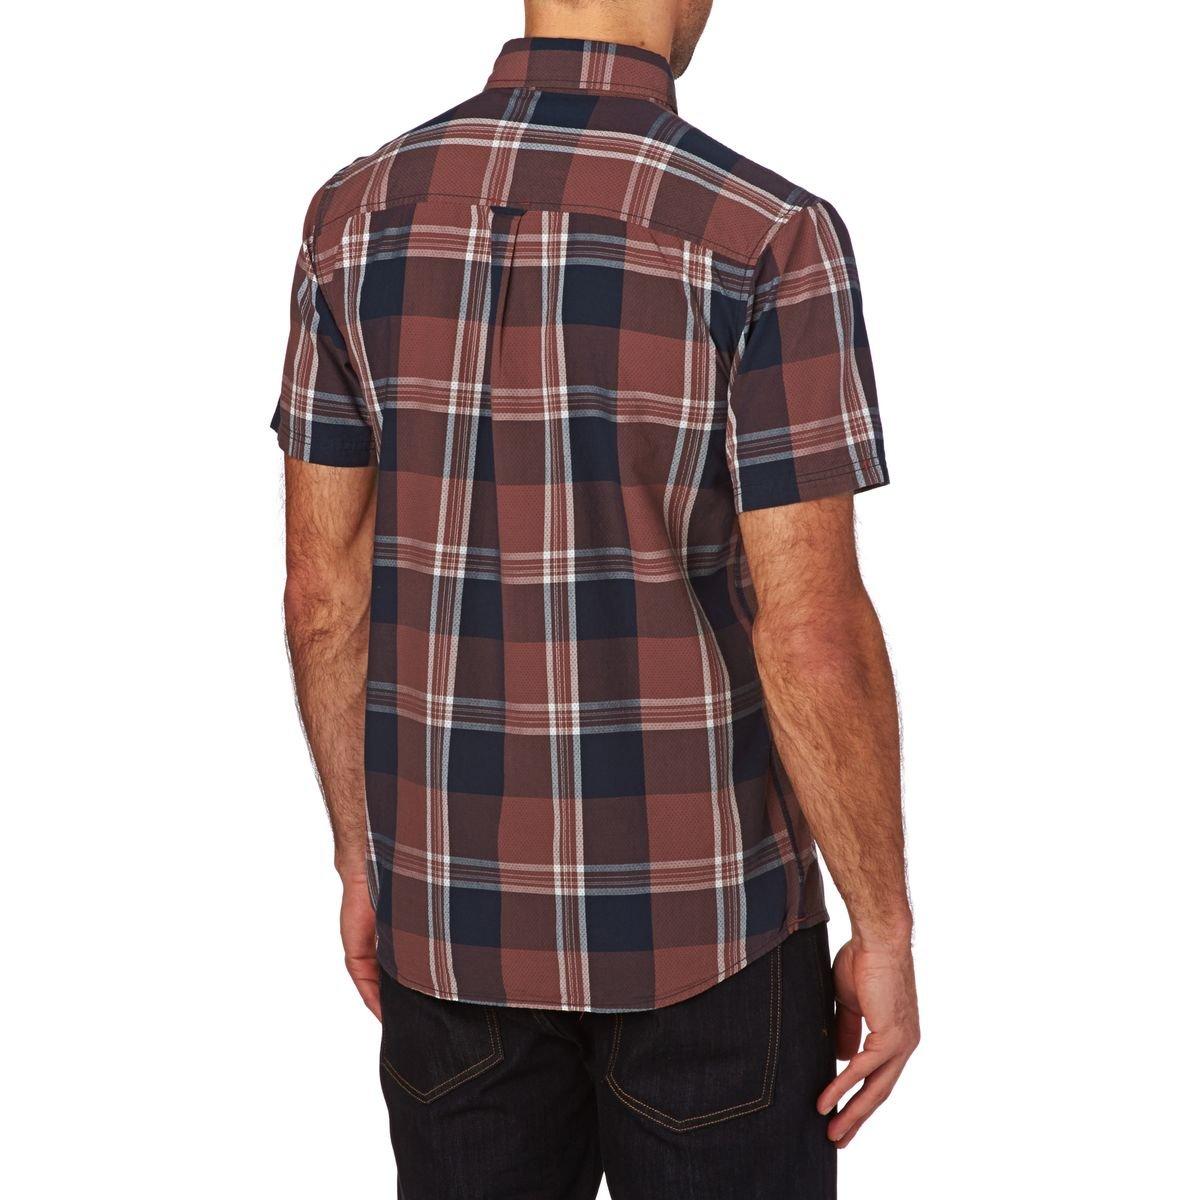 ELEMENT Deschutes Short Sleeve Shirt in Marsala Large